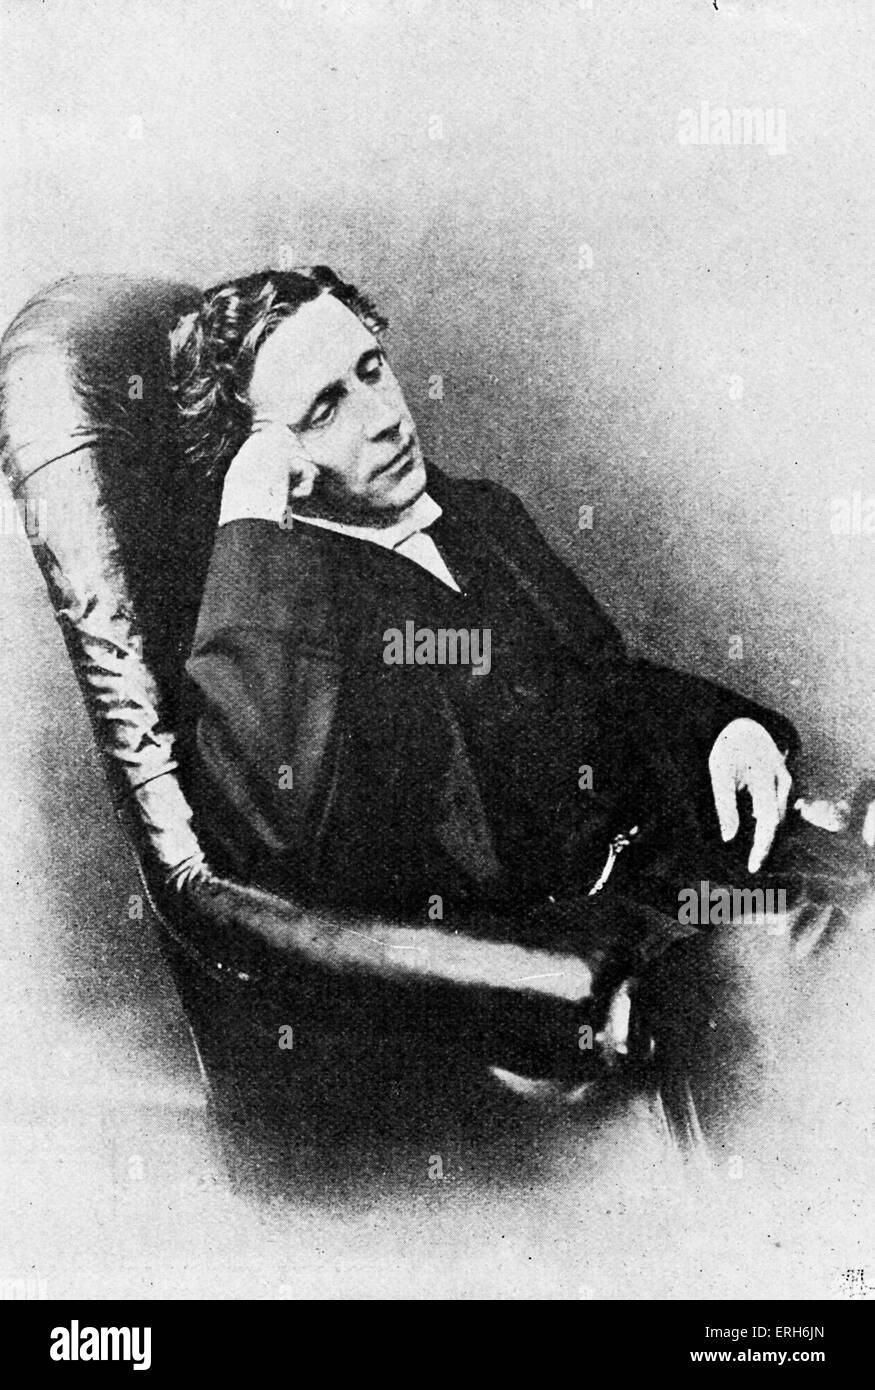 Lewis Carroll - portrait. (Real name Reverend Charles Lutwidge Dodgson) English author: 27 January 1832 - 14 January - Stock Image